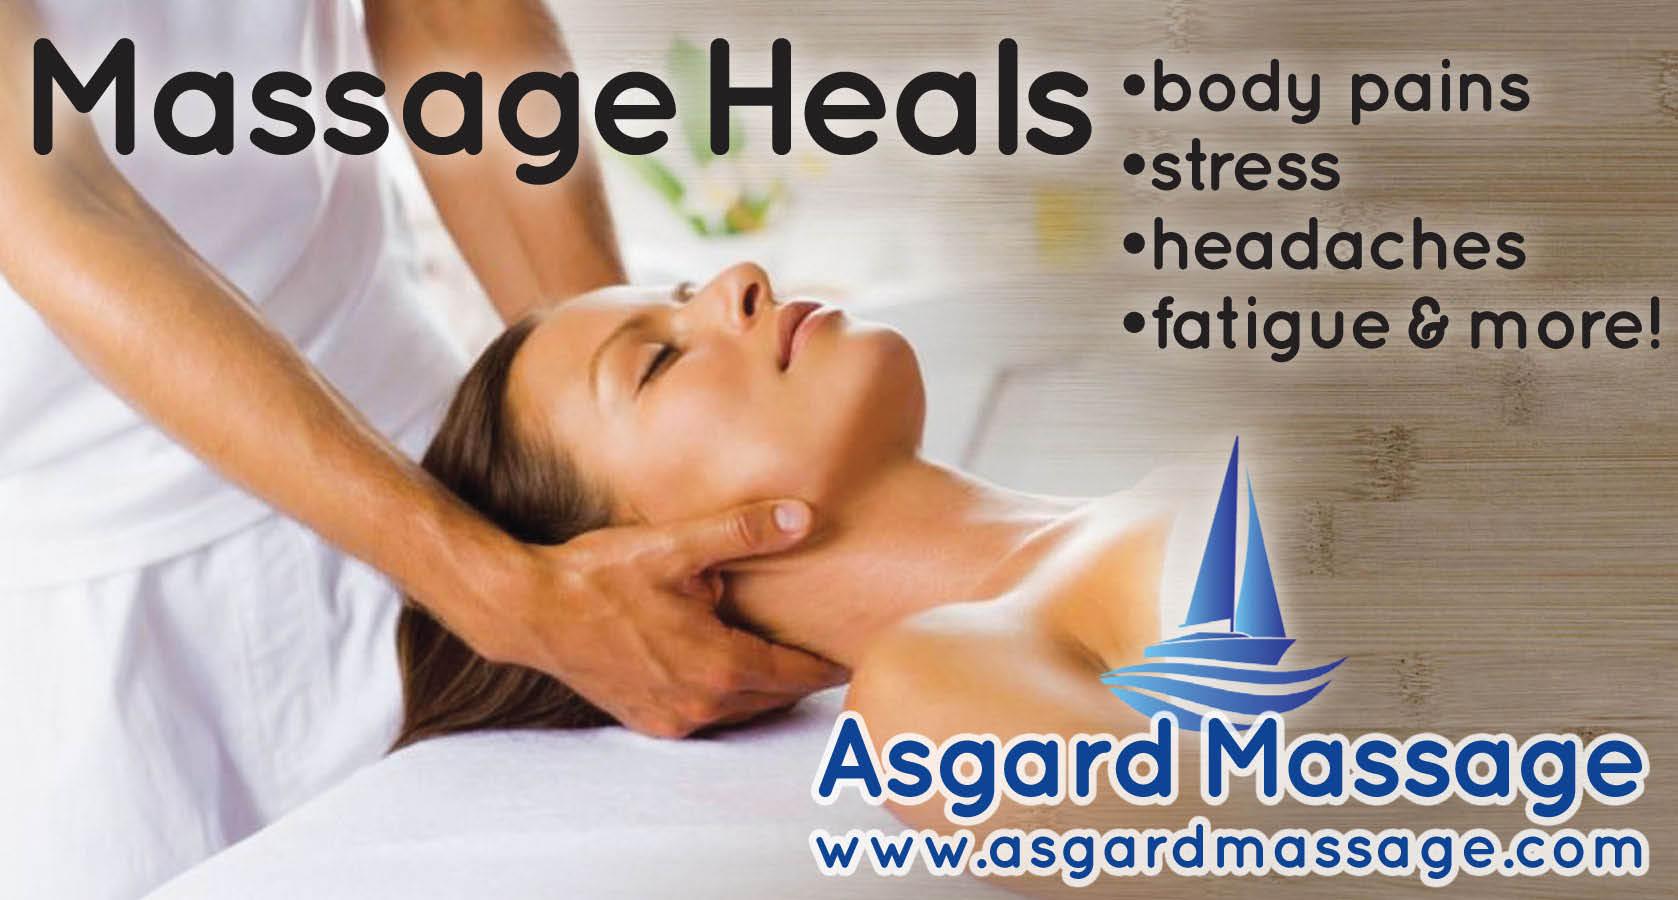 Asgard Massage Heals body pain, stress, headaches, fatigue and more